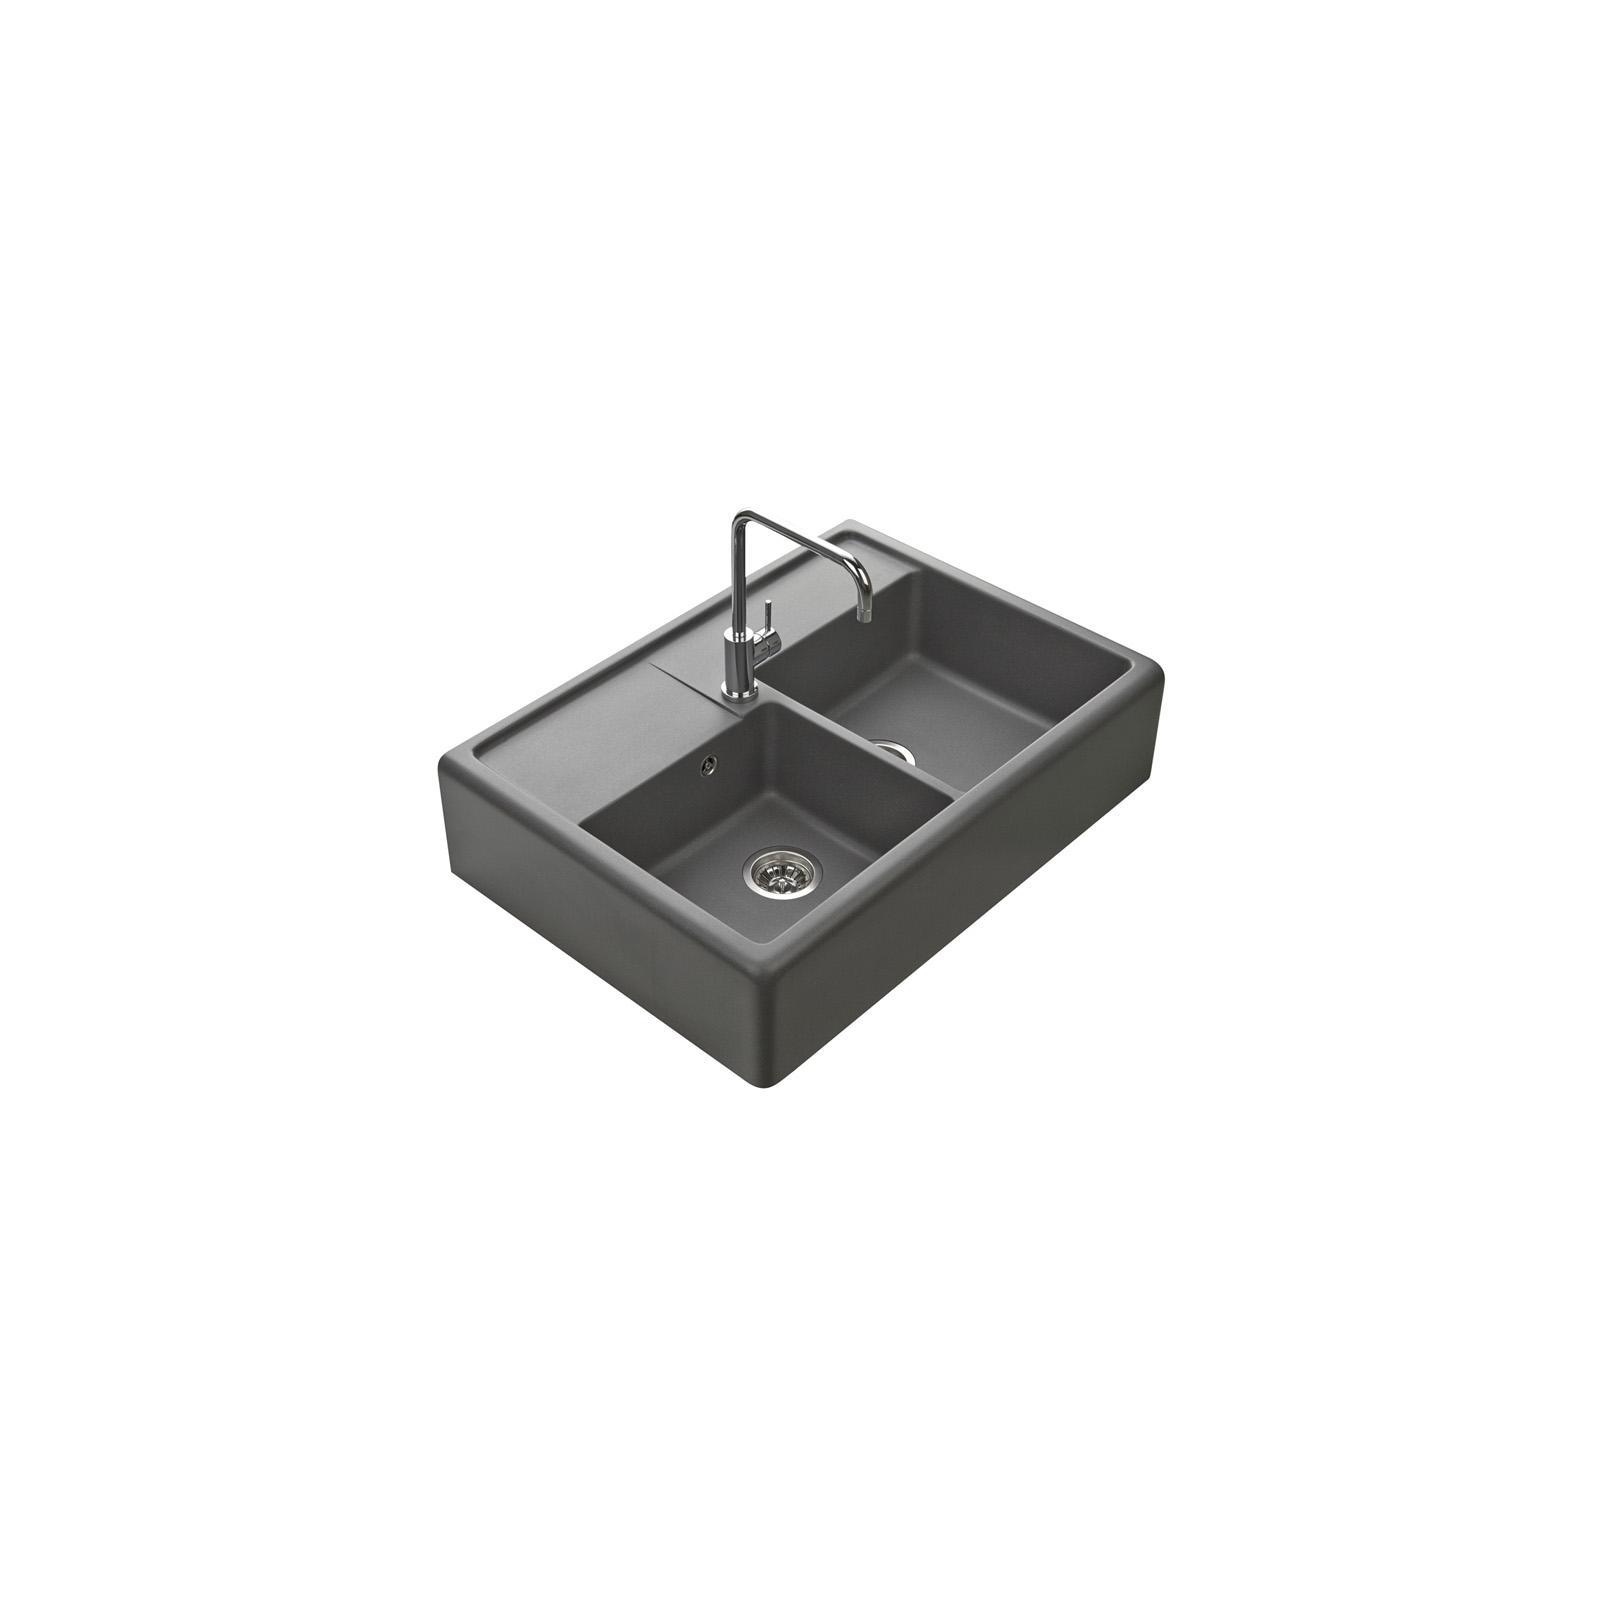 Evier haut de gamme Thibert III granit gris titanium - 2 bacs